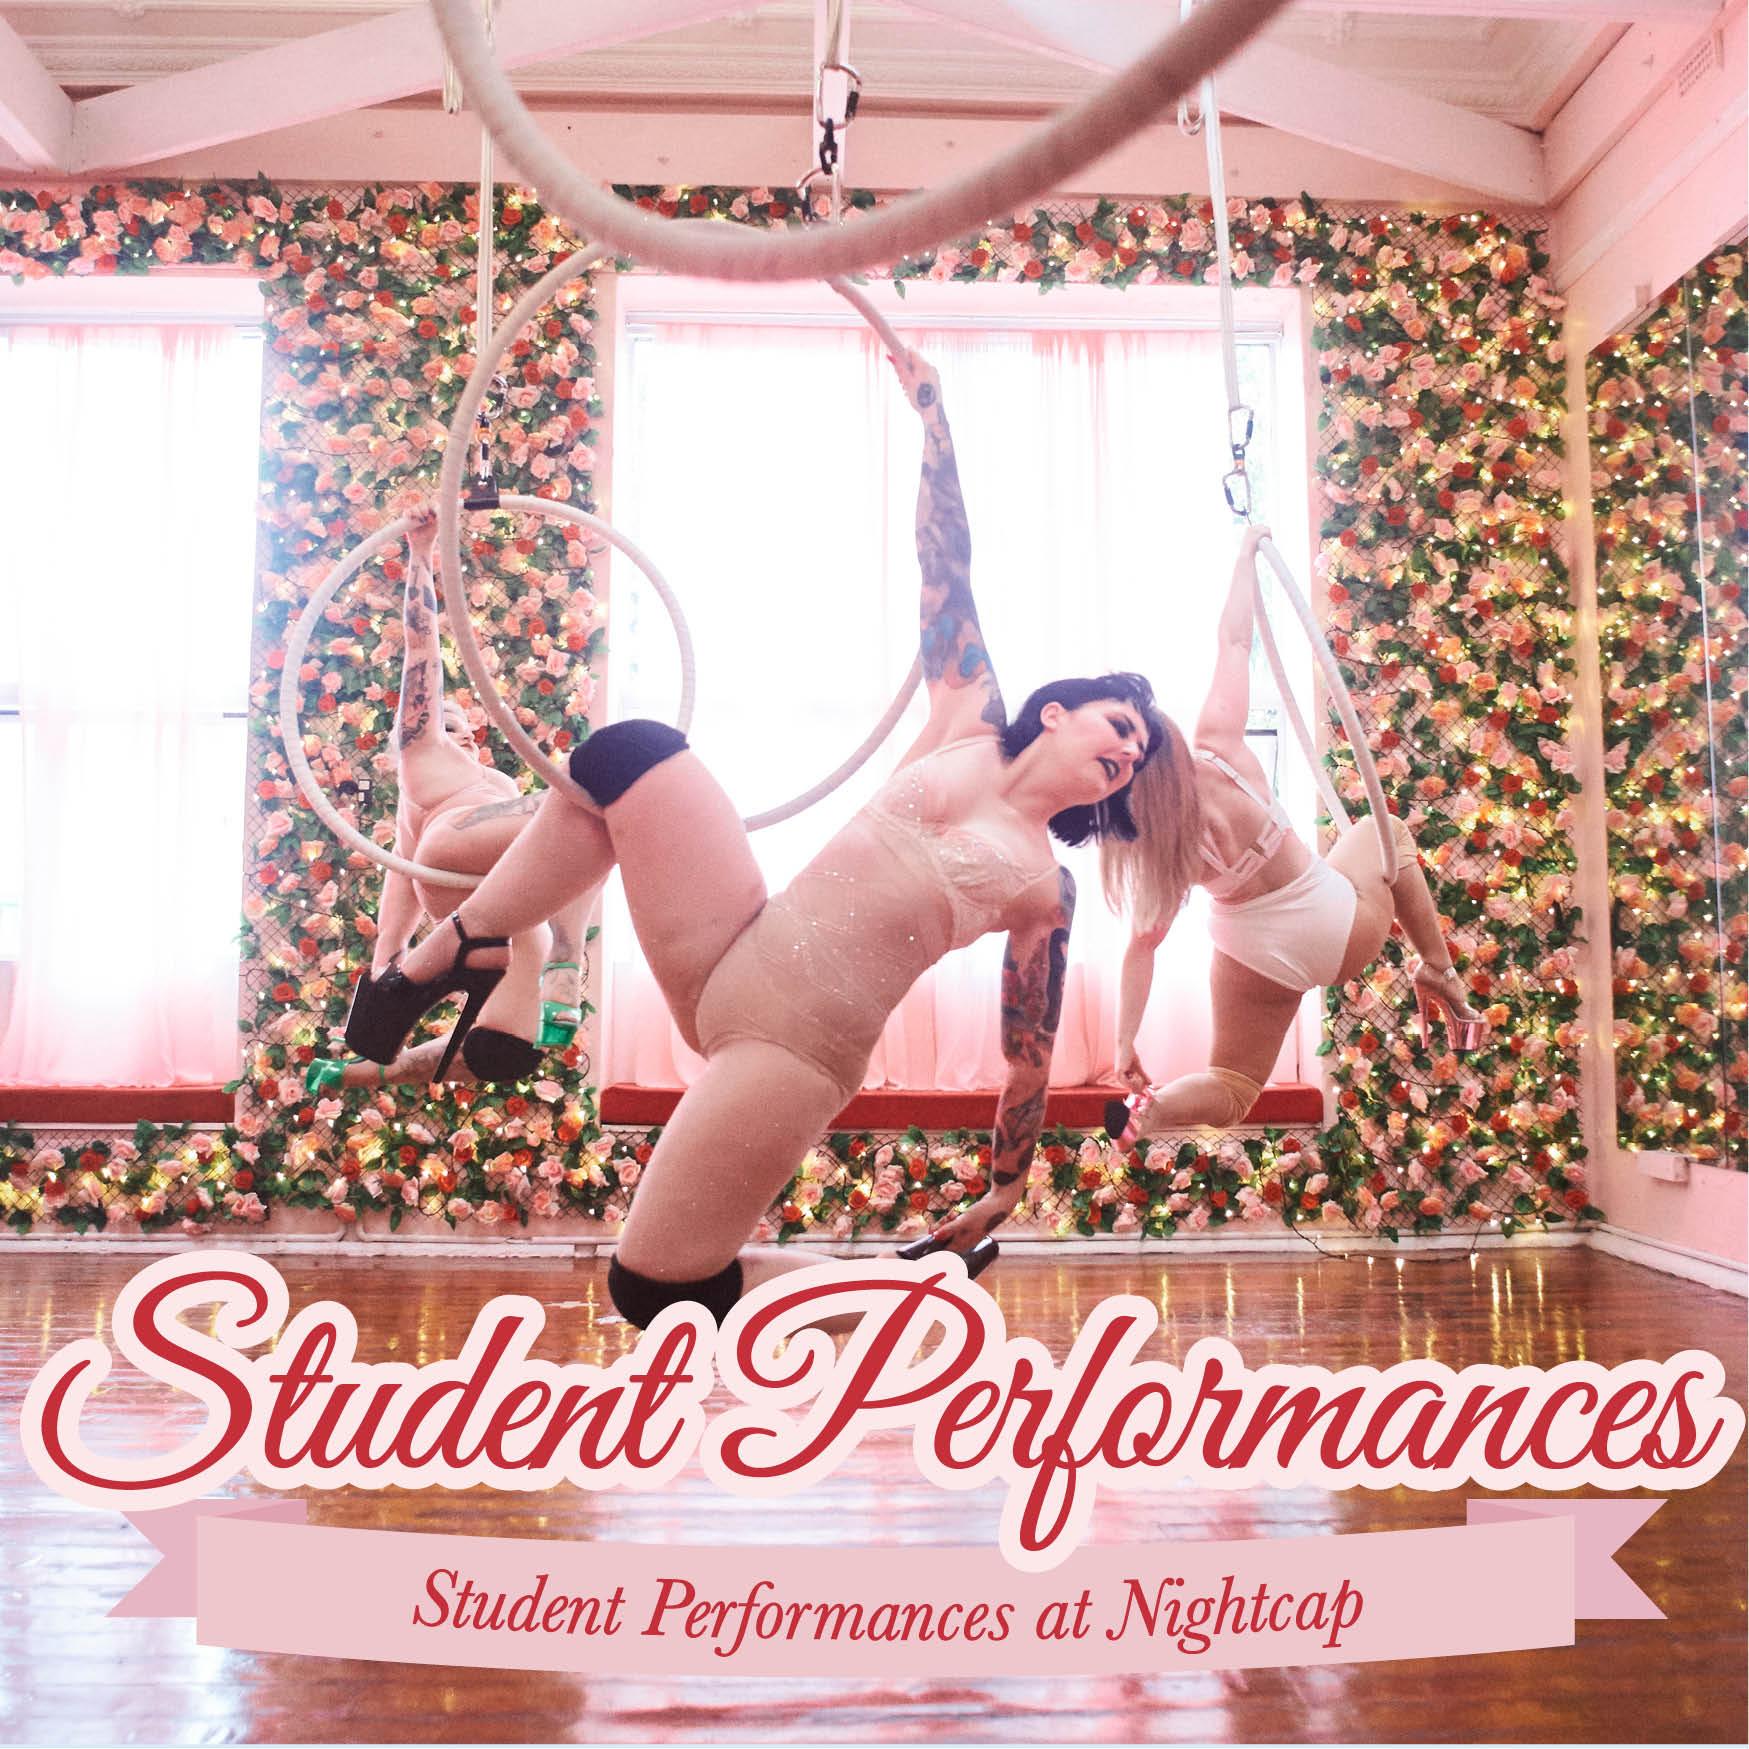 Student-Performances.jpg